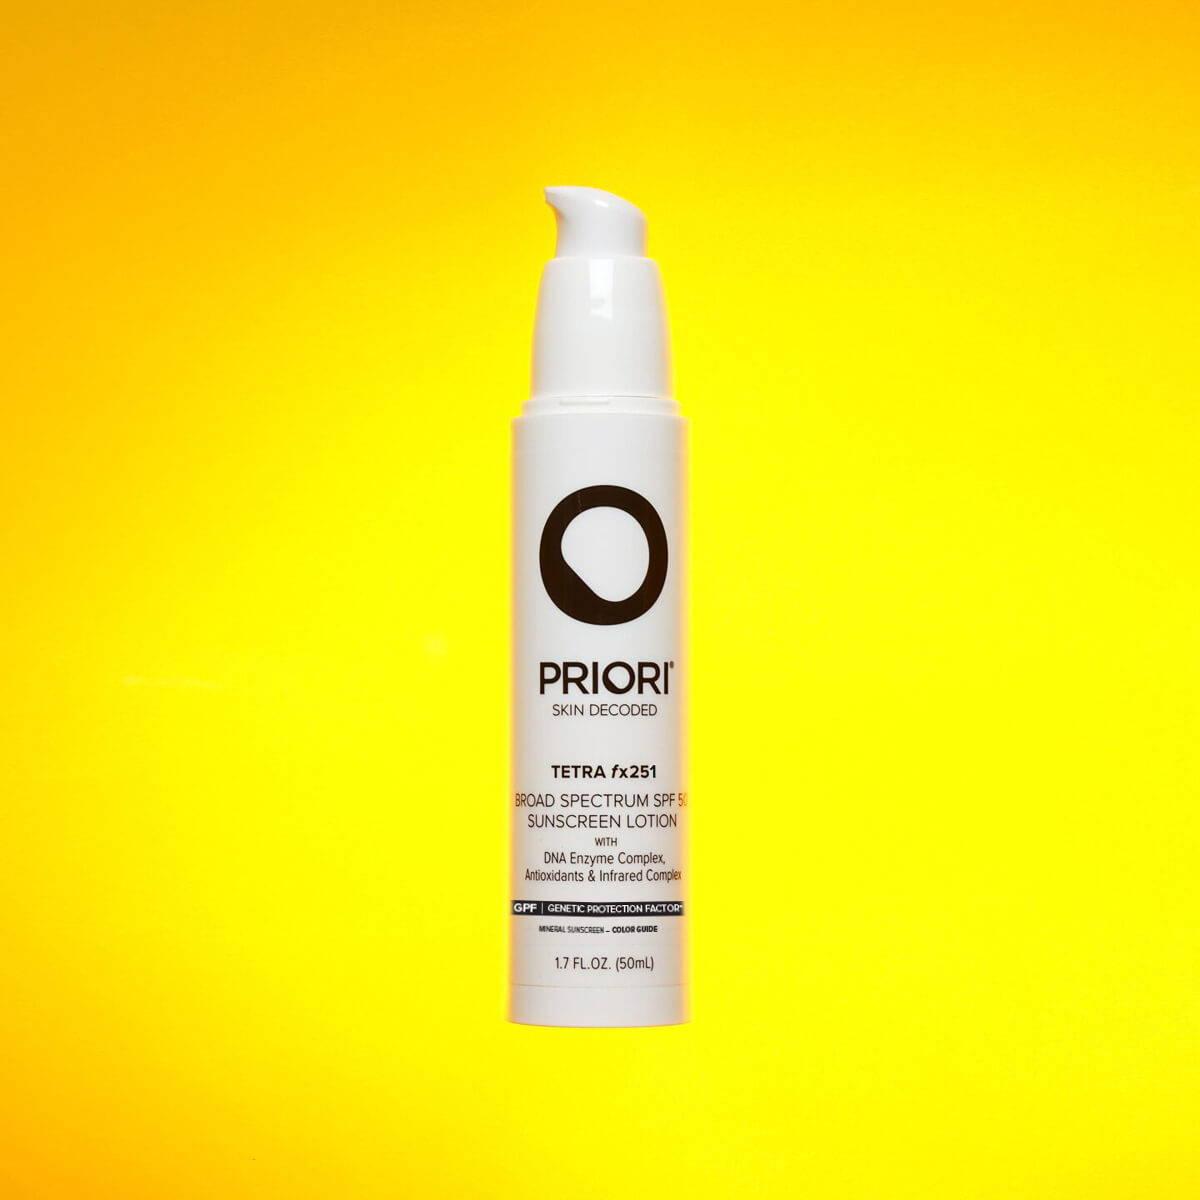 Priori Tetra Tinted Mineral Sunscreen